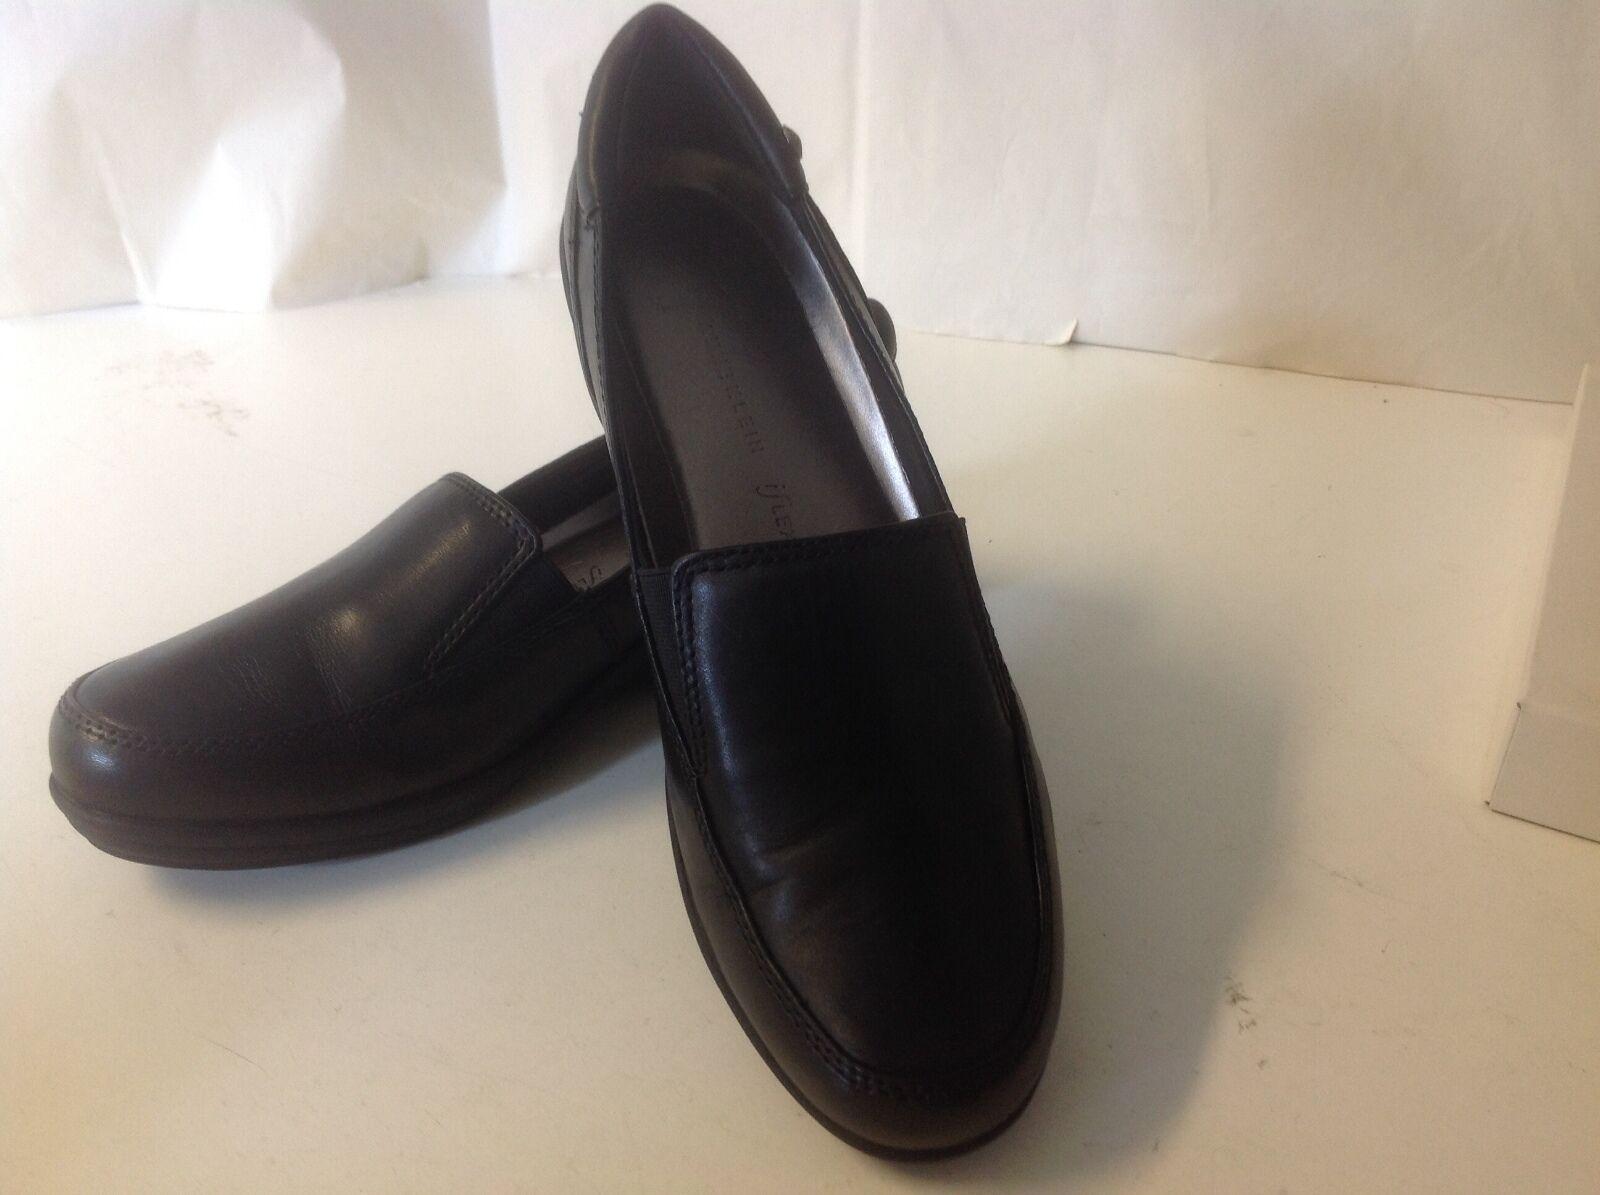 Anne Klein Gunnar Black 8 1/2 M New Leather Closed Toe iFlex Low Heel Wedge